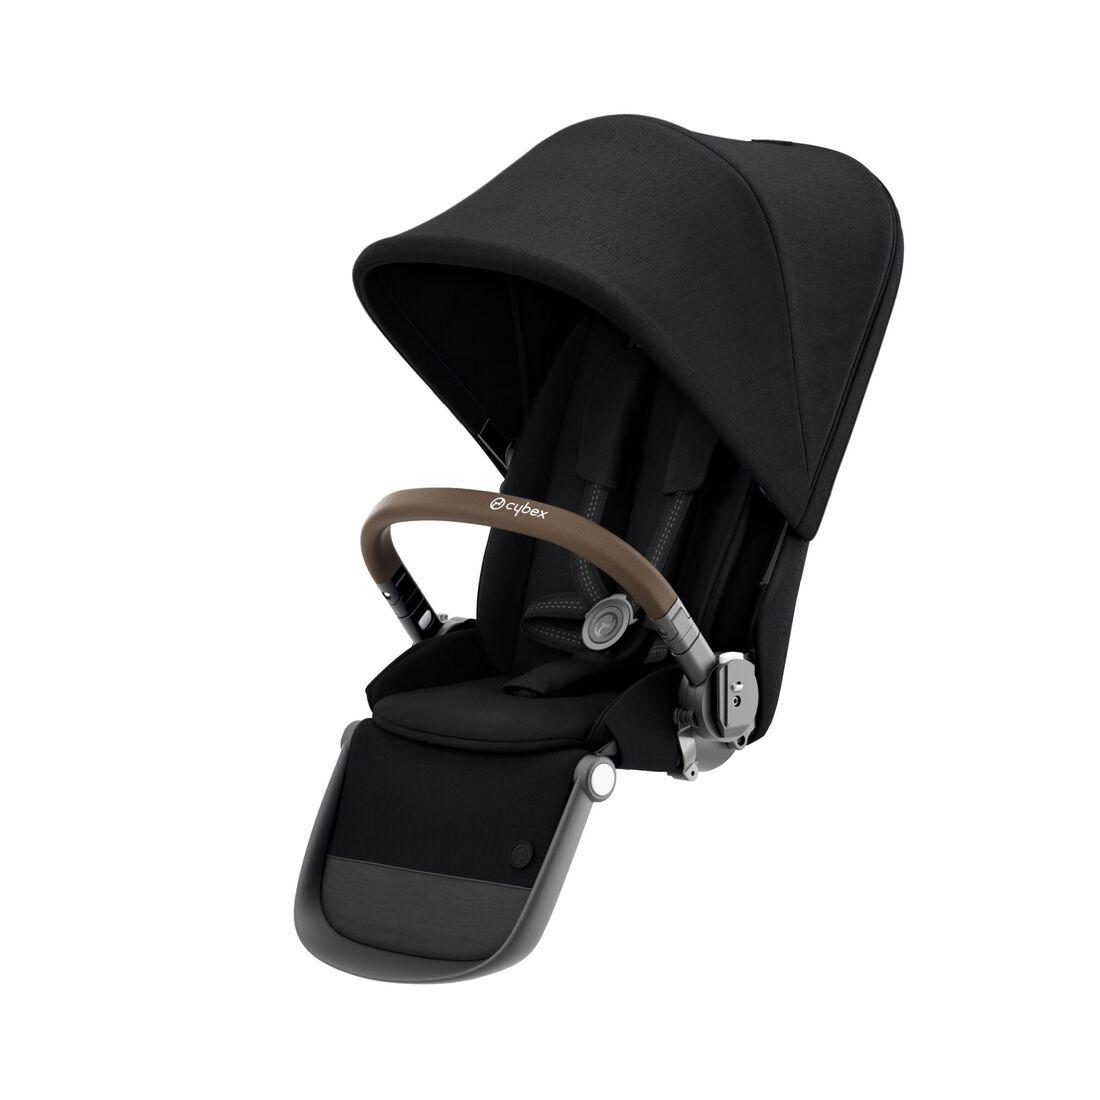 CYBEX Gazelle S Seat Unit - Deep Black (Taupe Frame) in Deep Black (Taupe Frame) large image number 1